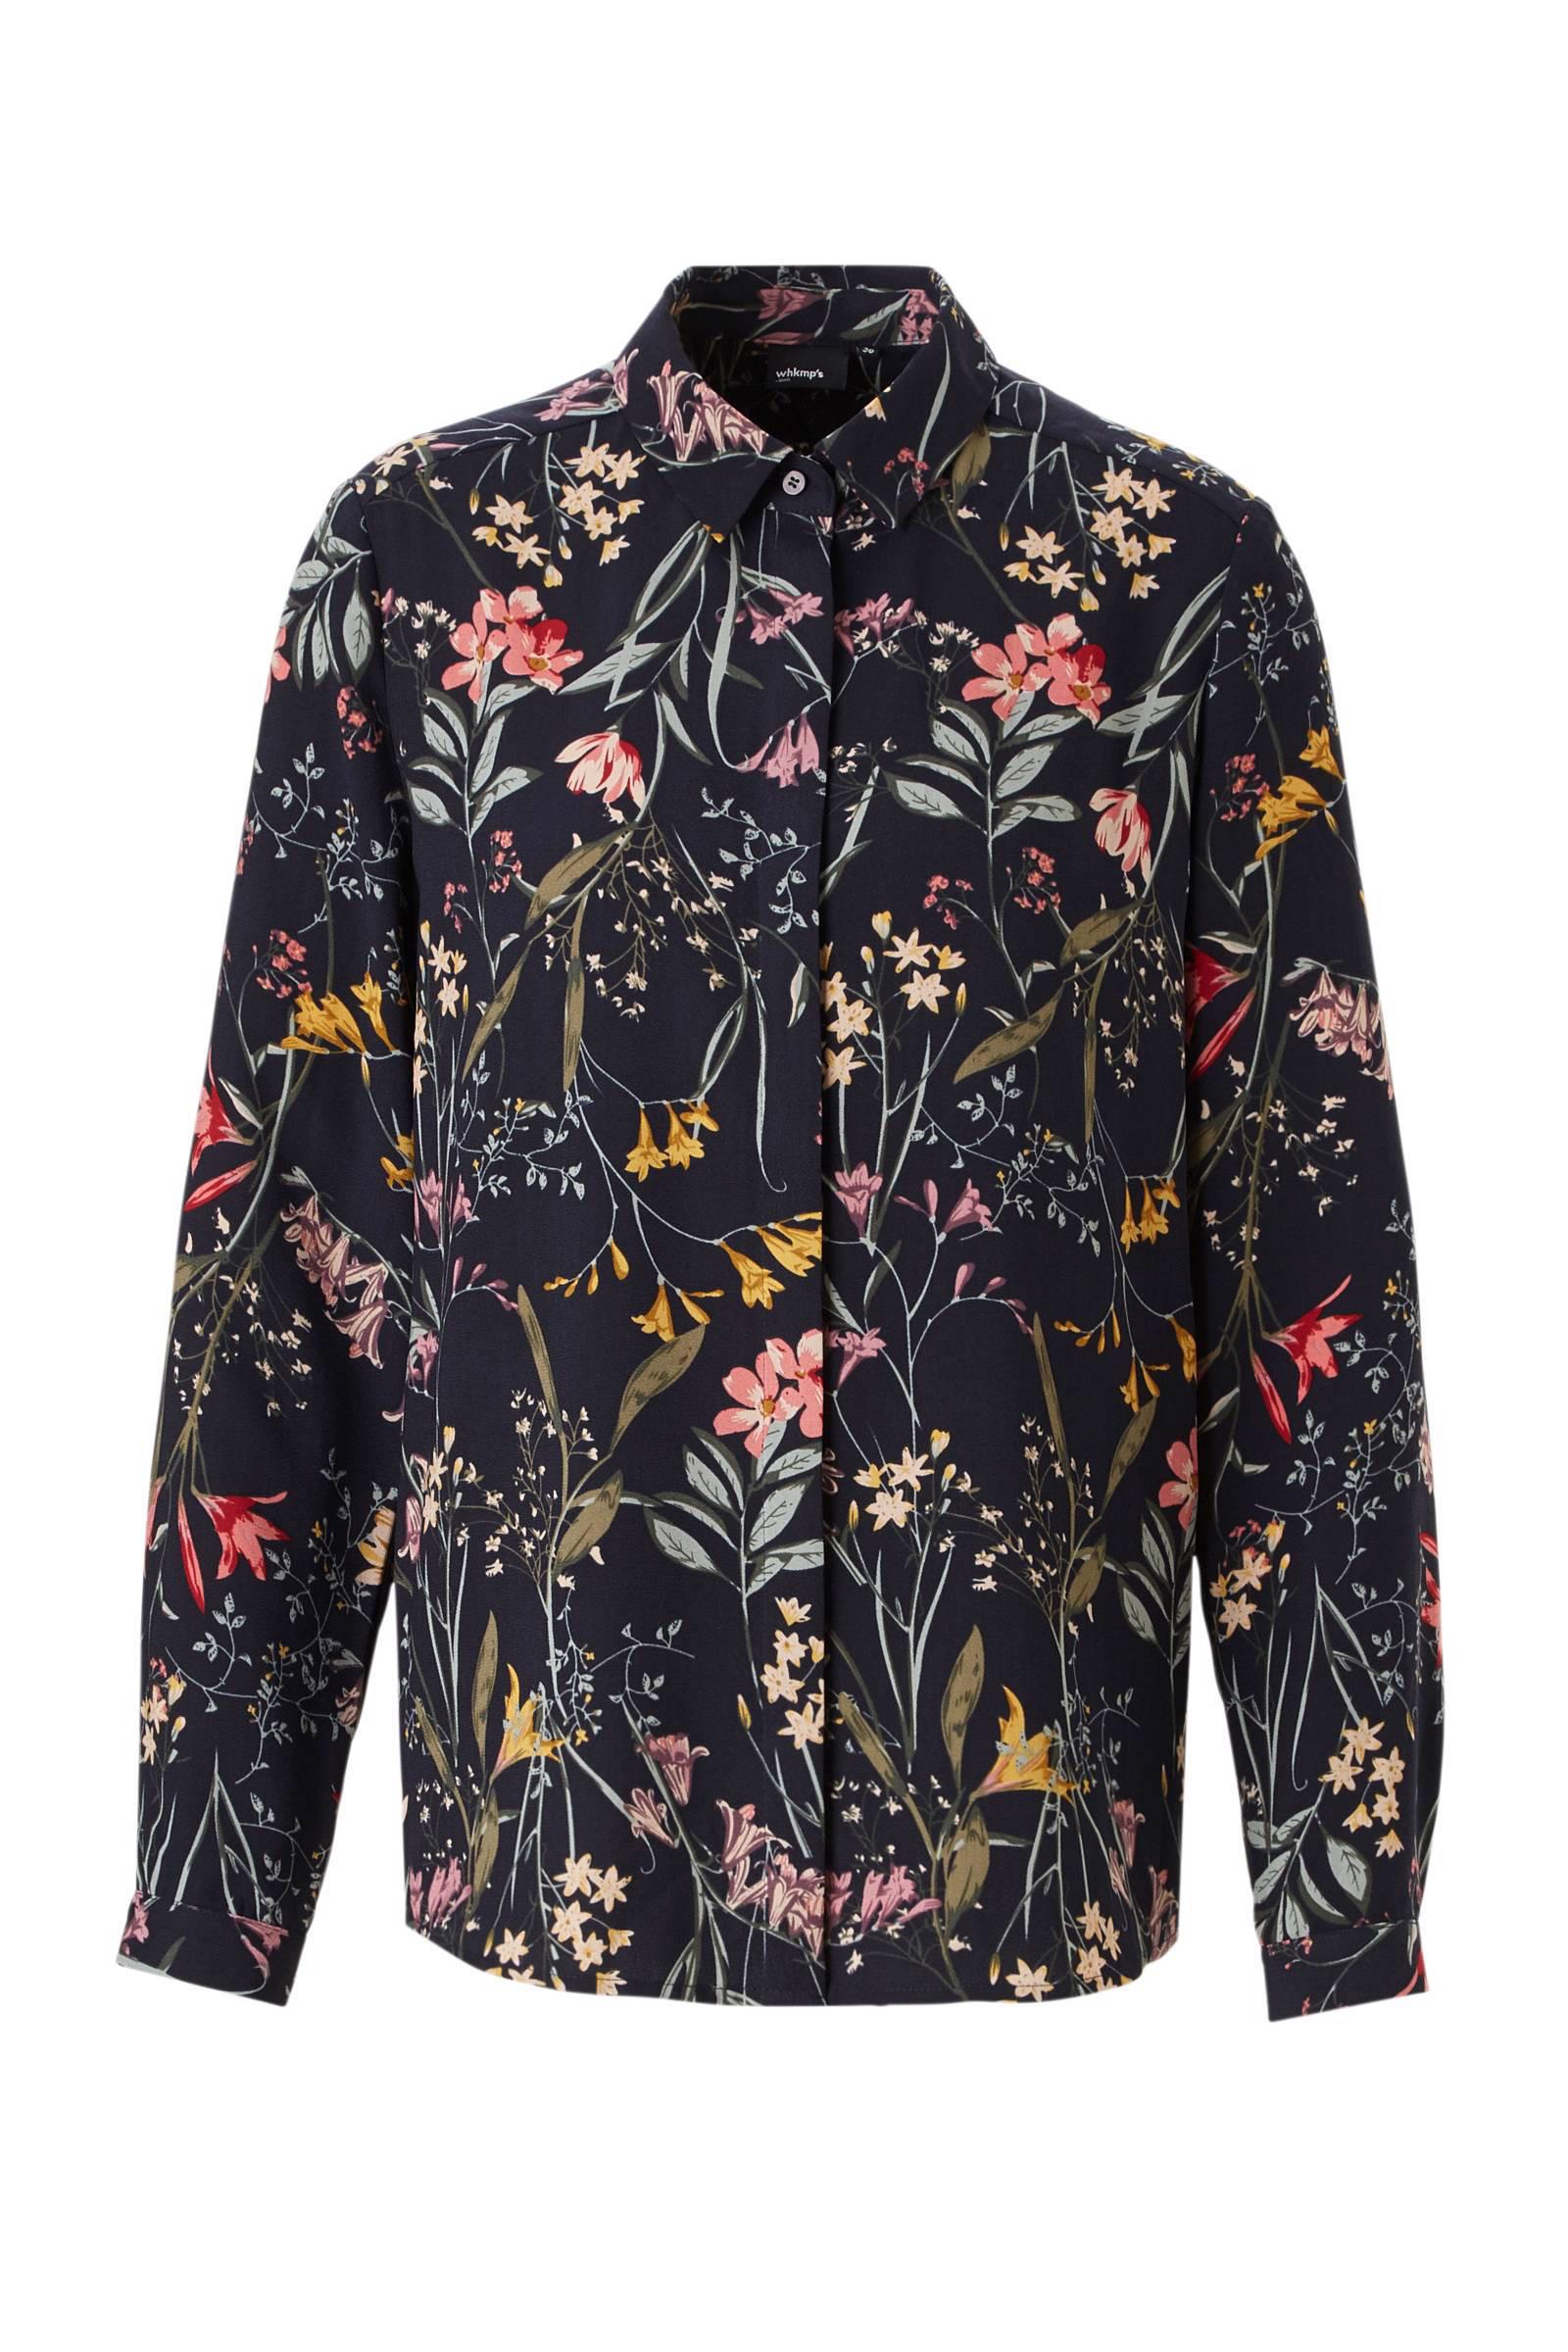 whkmp's own blouse met bloemenprint (dames)